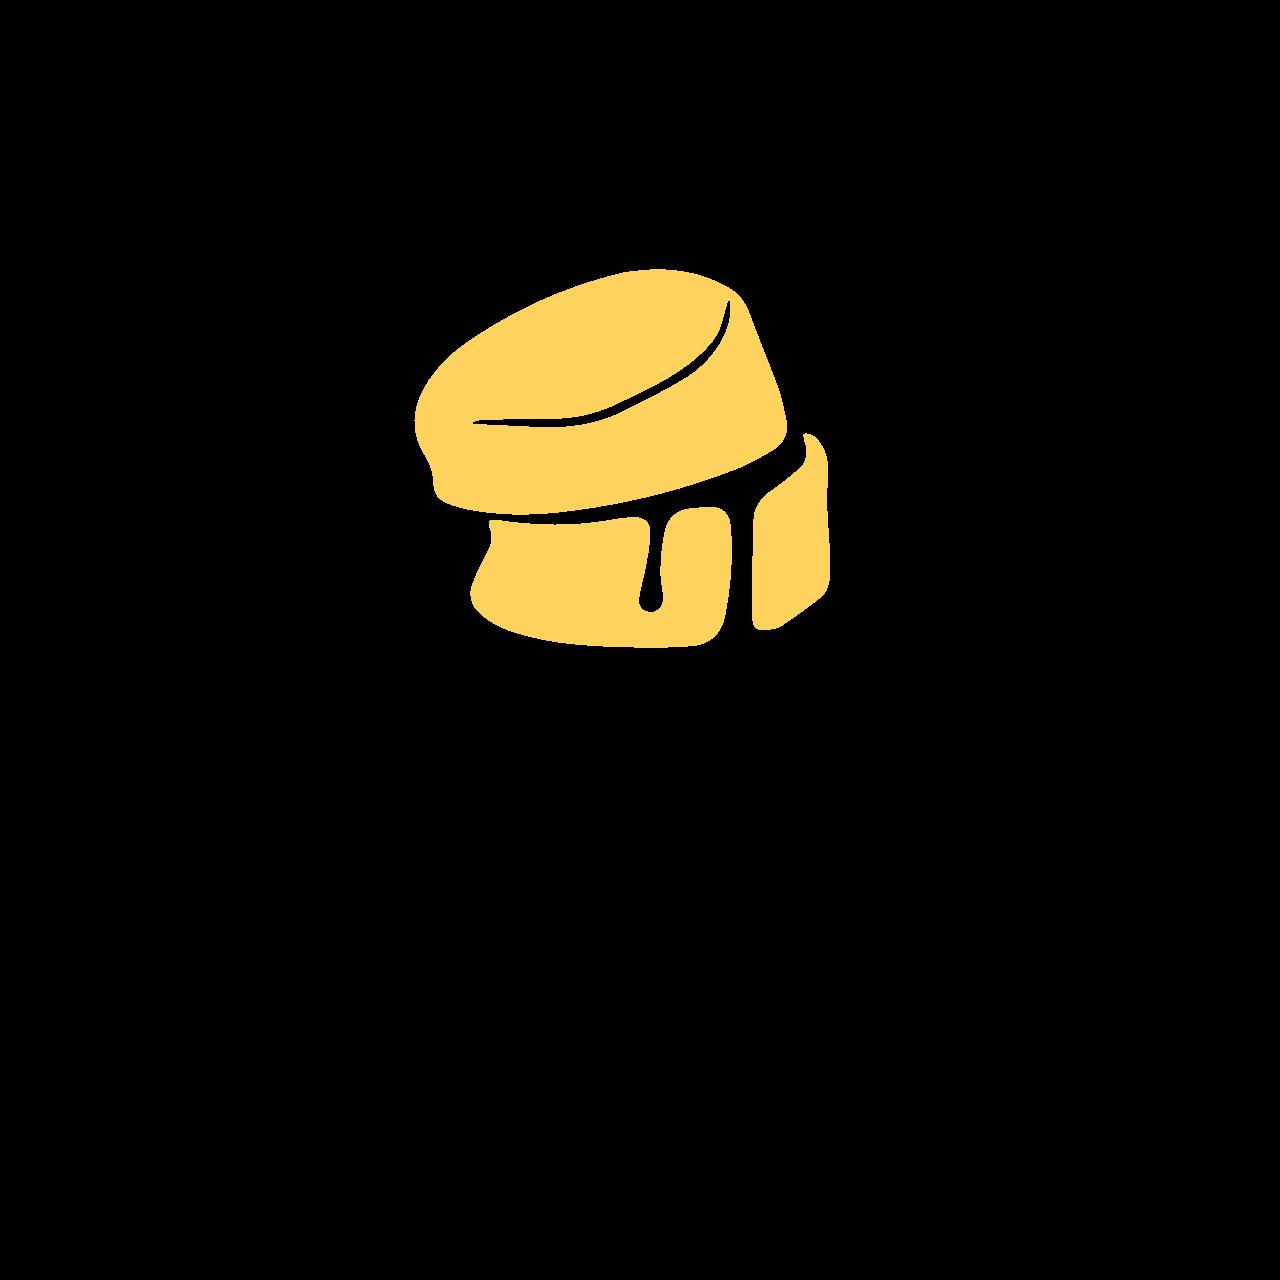 Fuwa Fuwa logo